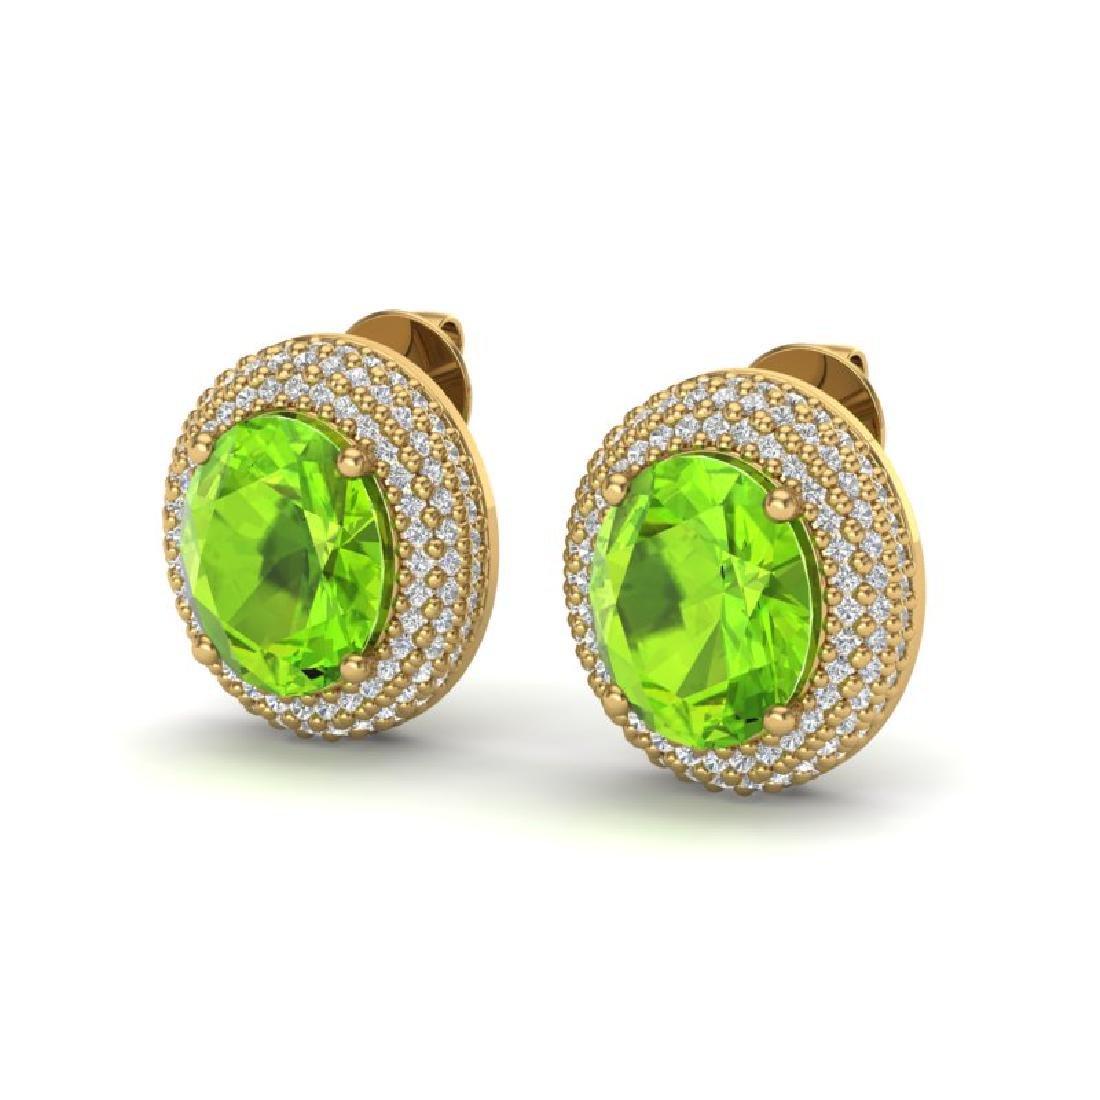 9 CTW Peridot & Micro Pave VS/SI Diamond Earrings 18K